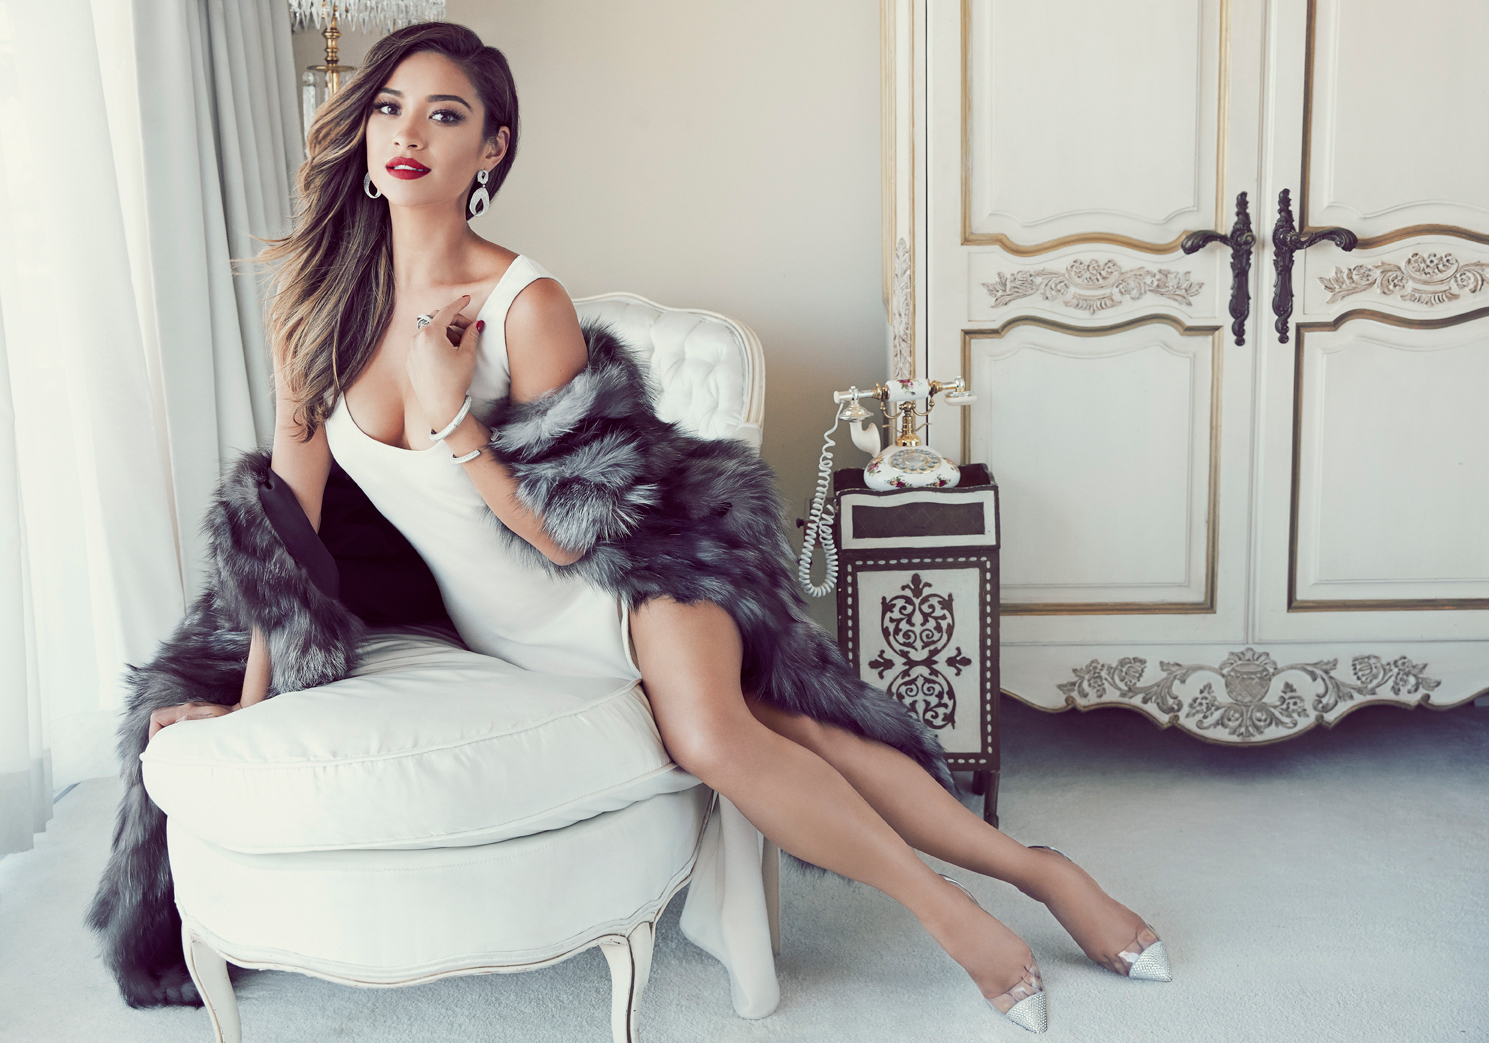 https://www.theplace.ru/archive/shay_mitchell/img/celeber_ru_shay_mitchell_glamour_mx_magazine_photoshoot_2014_02.jpg